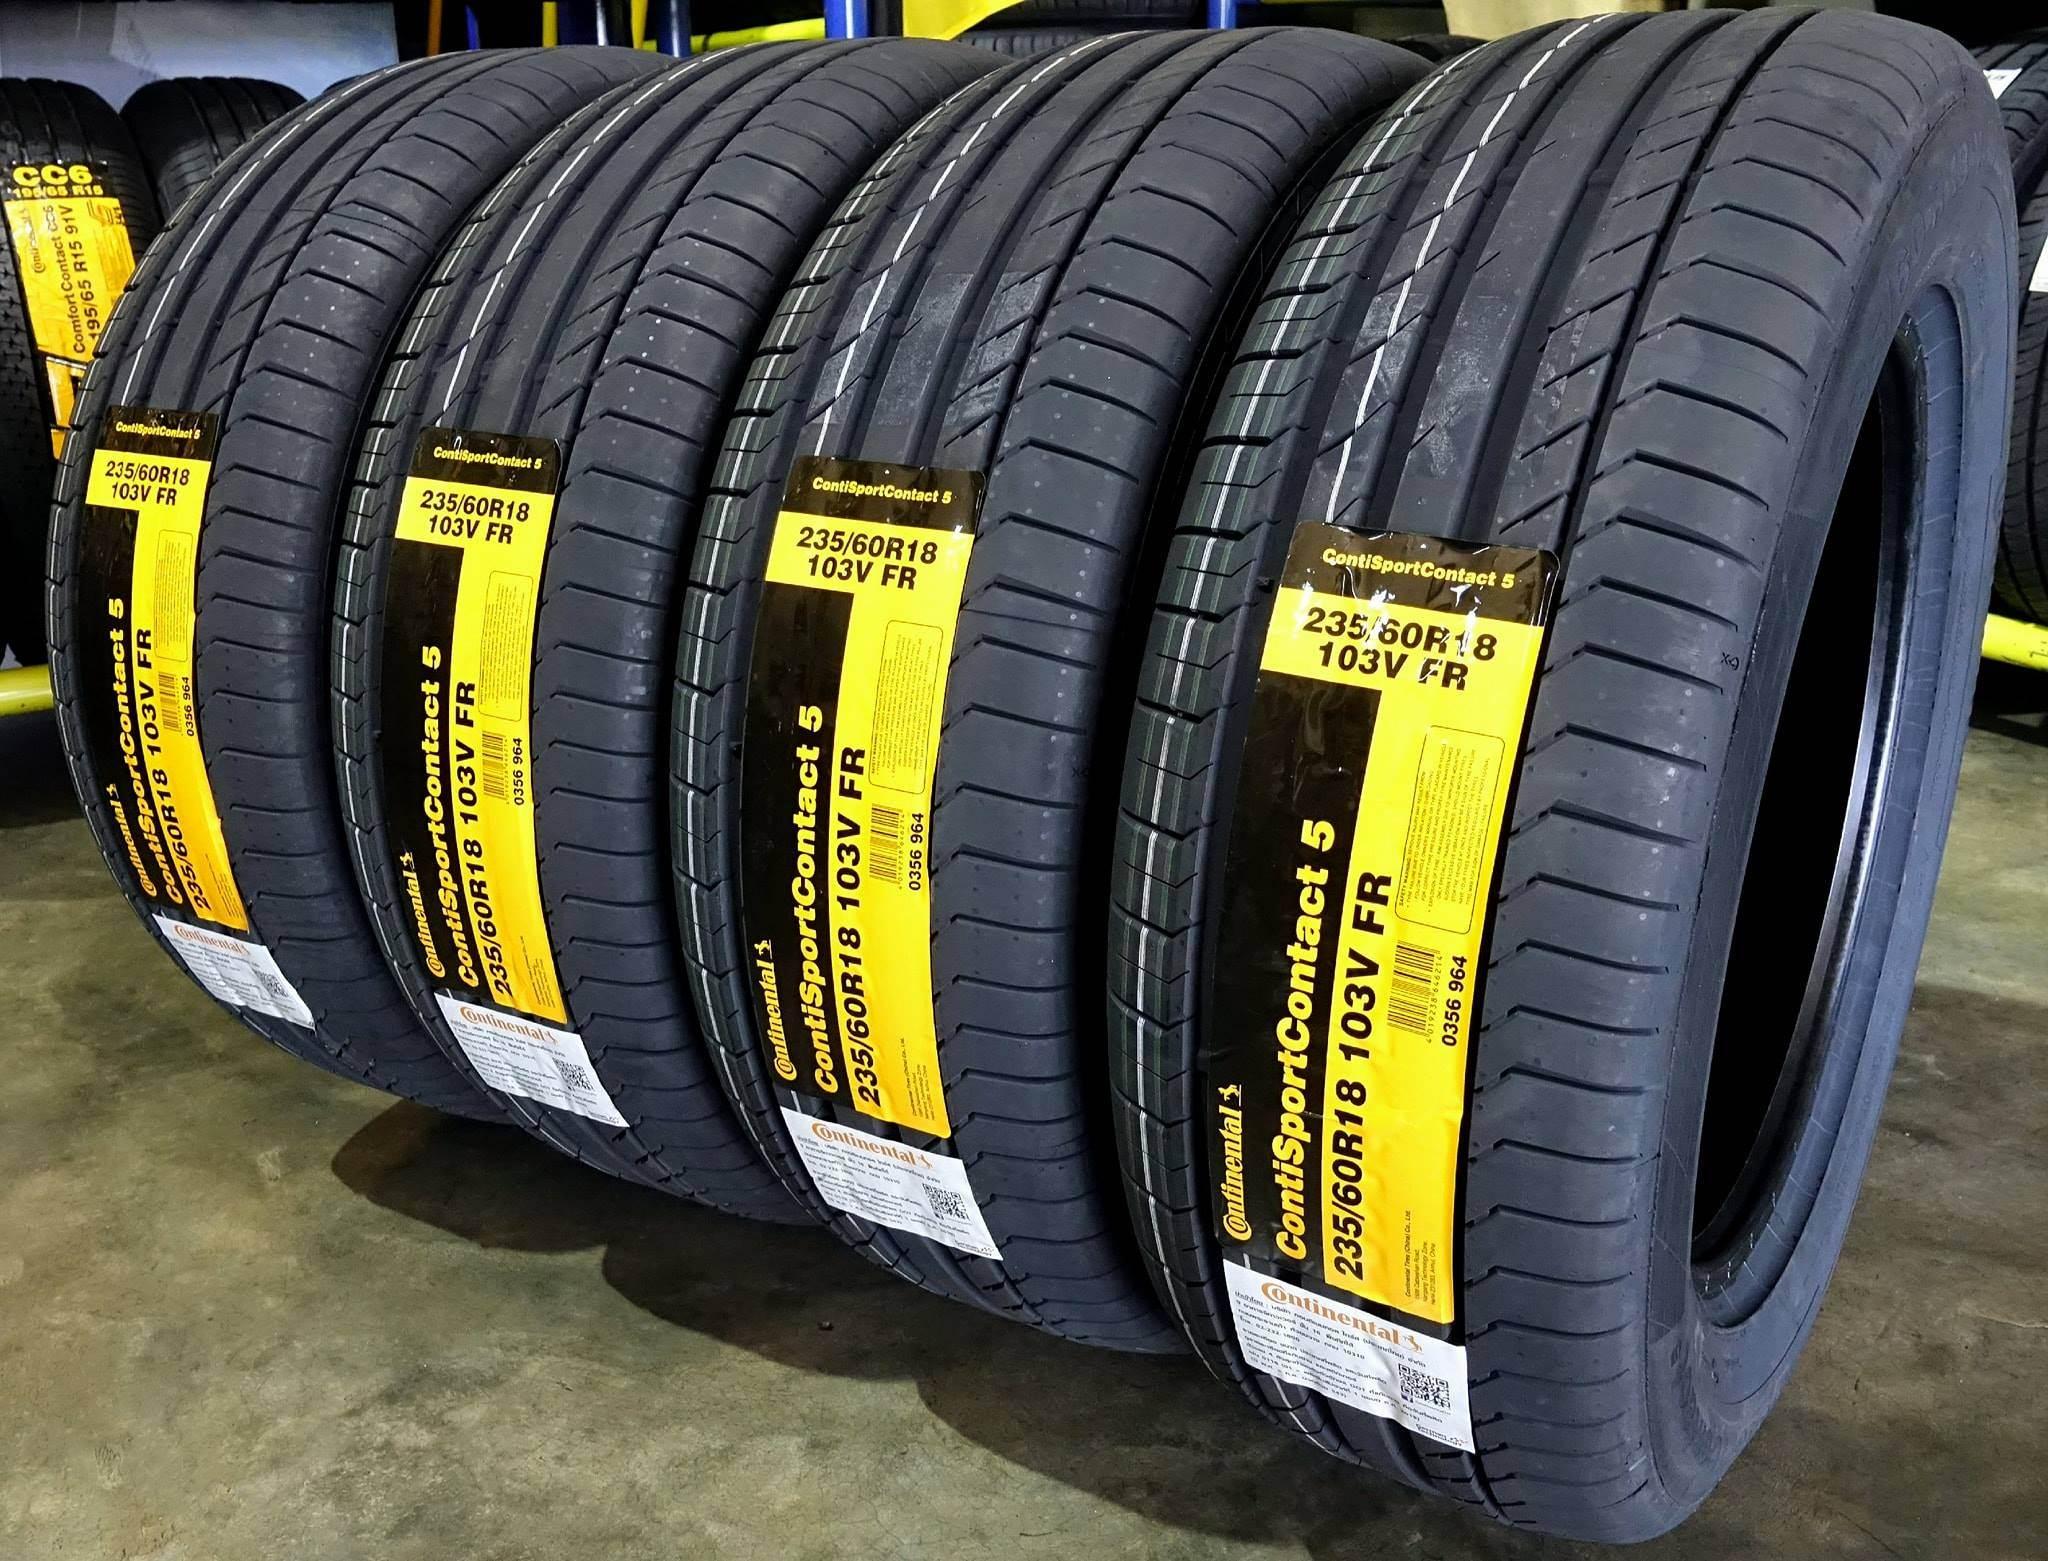 Lốp xe Kia Sorento 235/60R18 Continental SCS5 giá rẻ